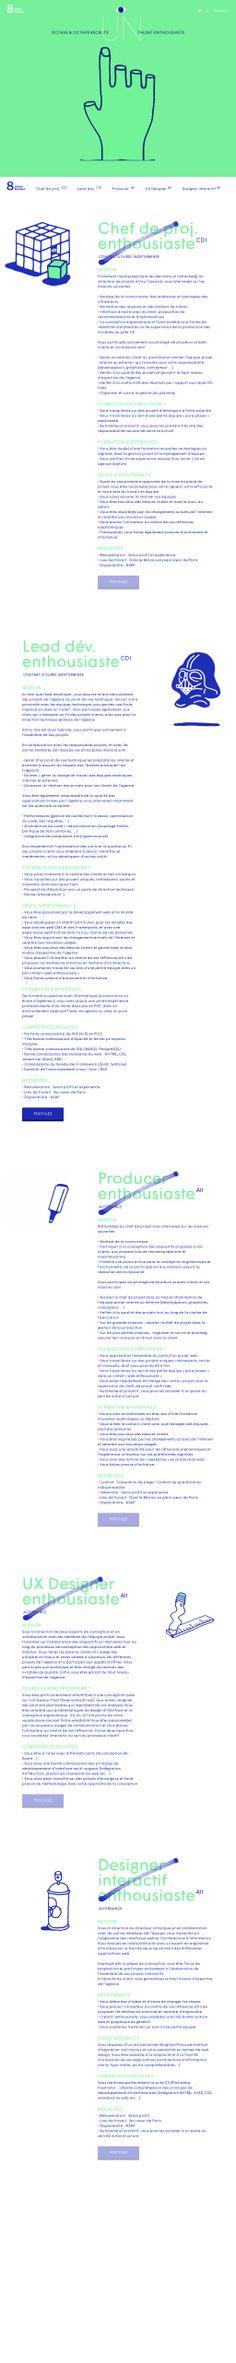 http://www.octaveoctave.com/jobs/